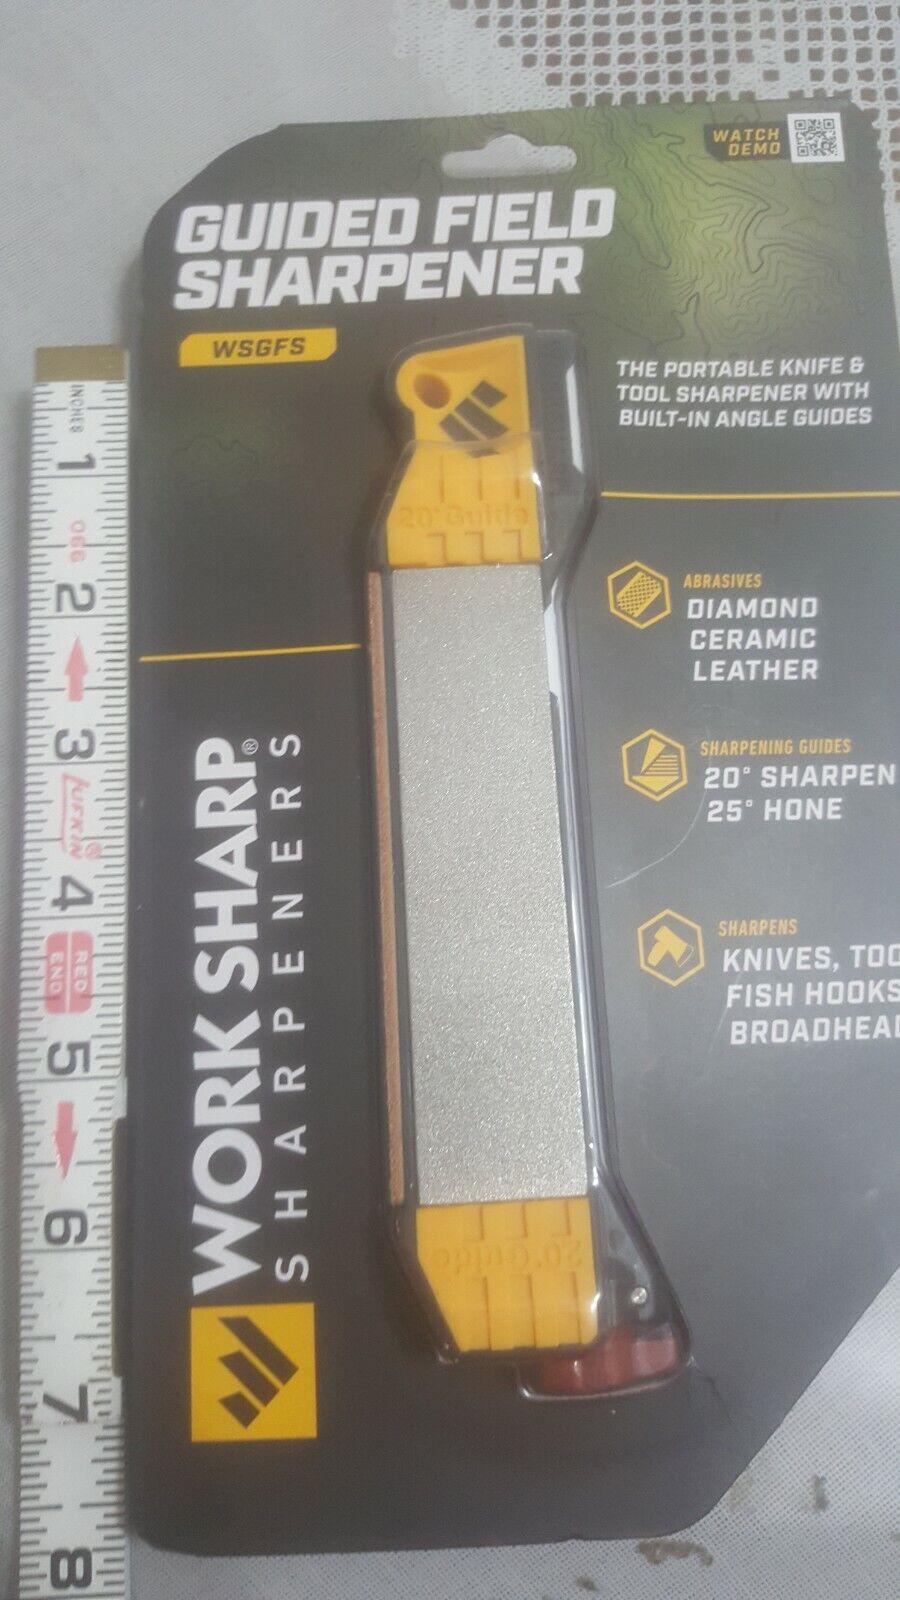 Work Sharp WSGFS221 Guided Field Sharpener for sale online